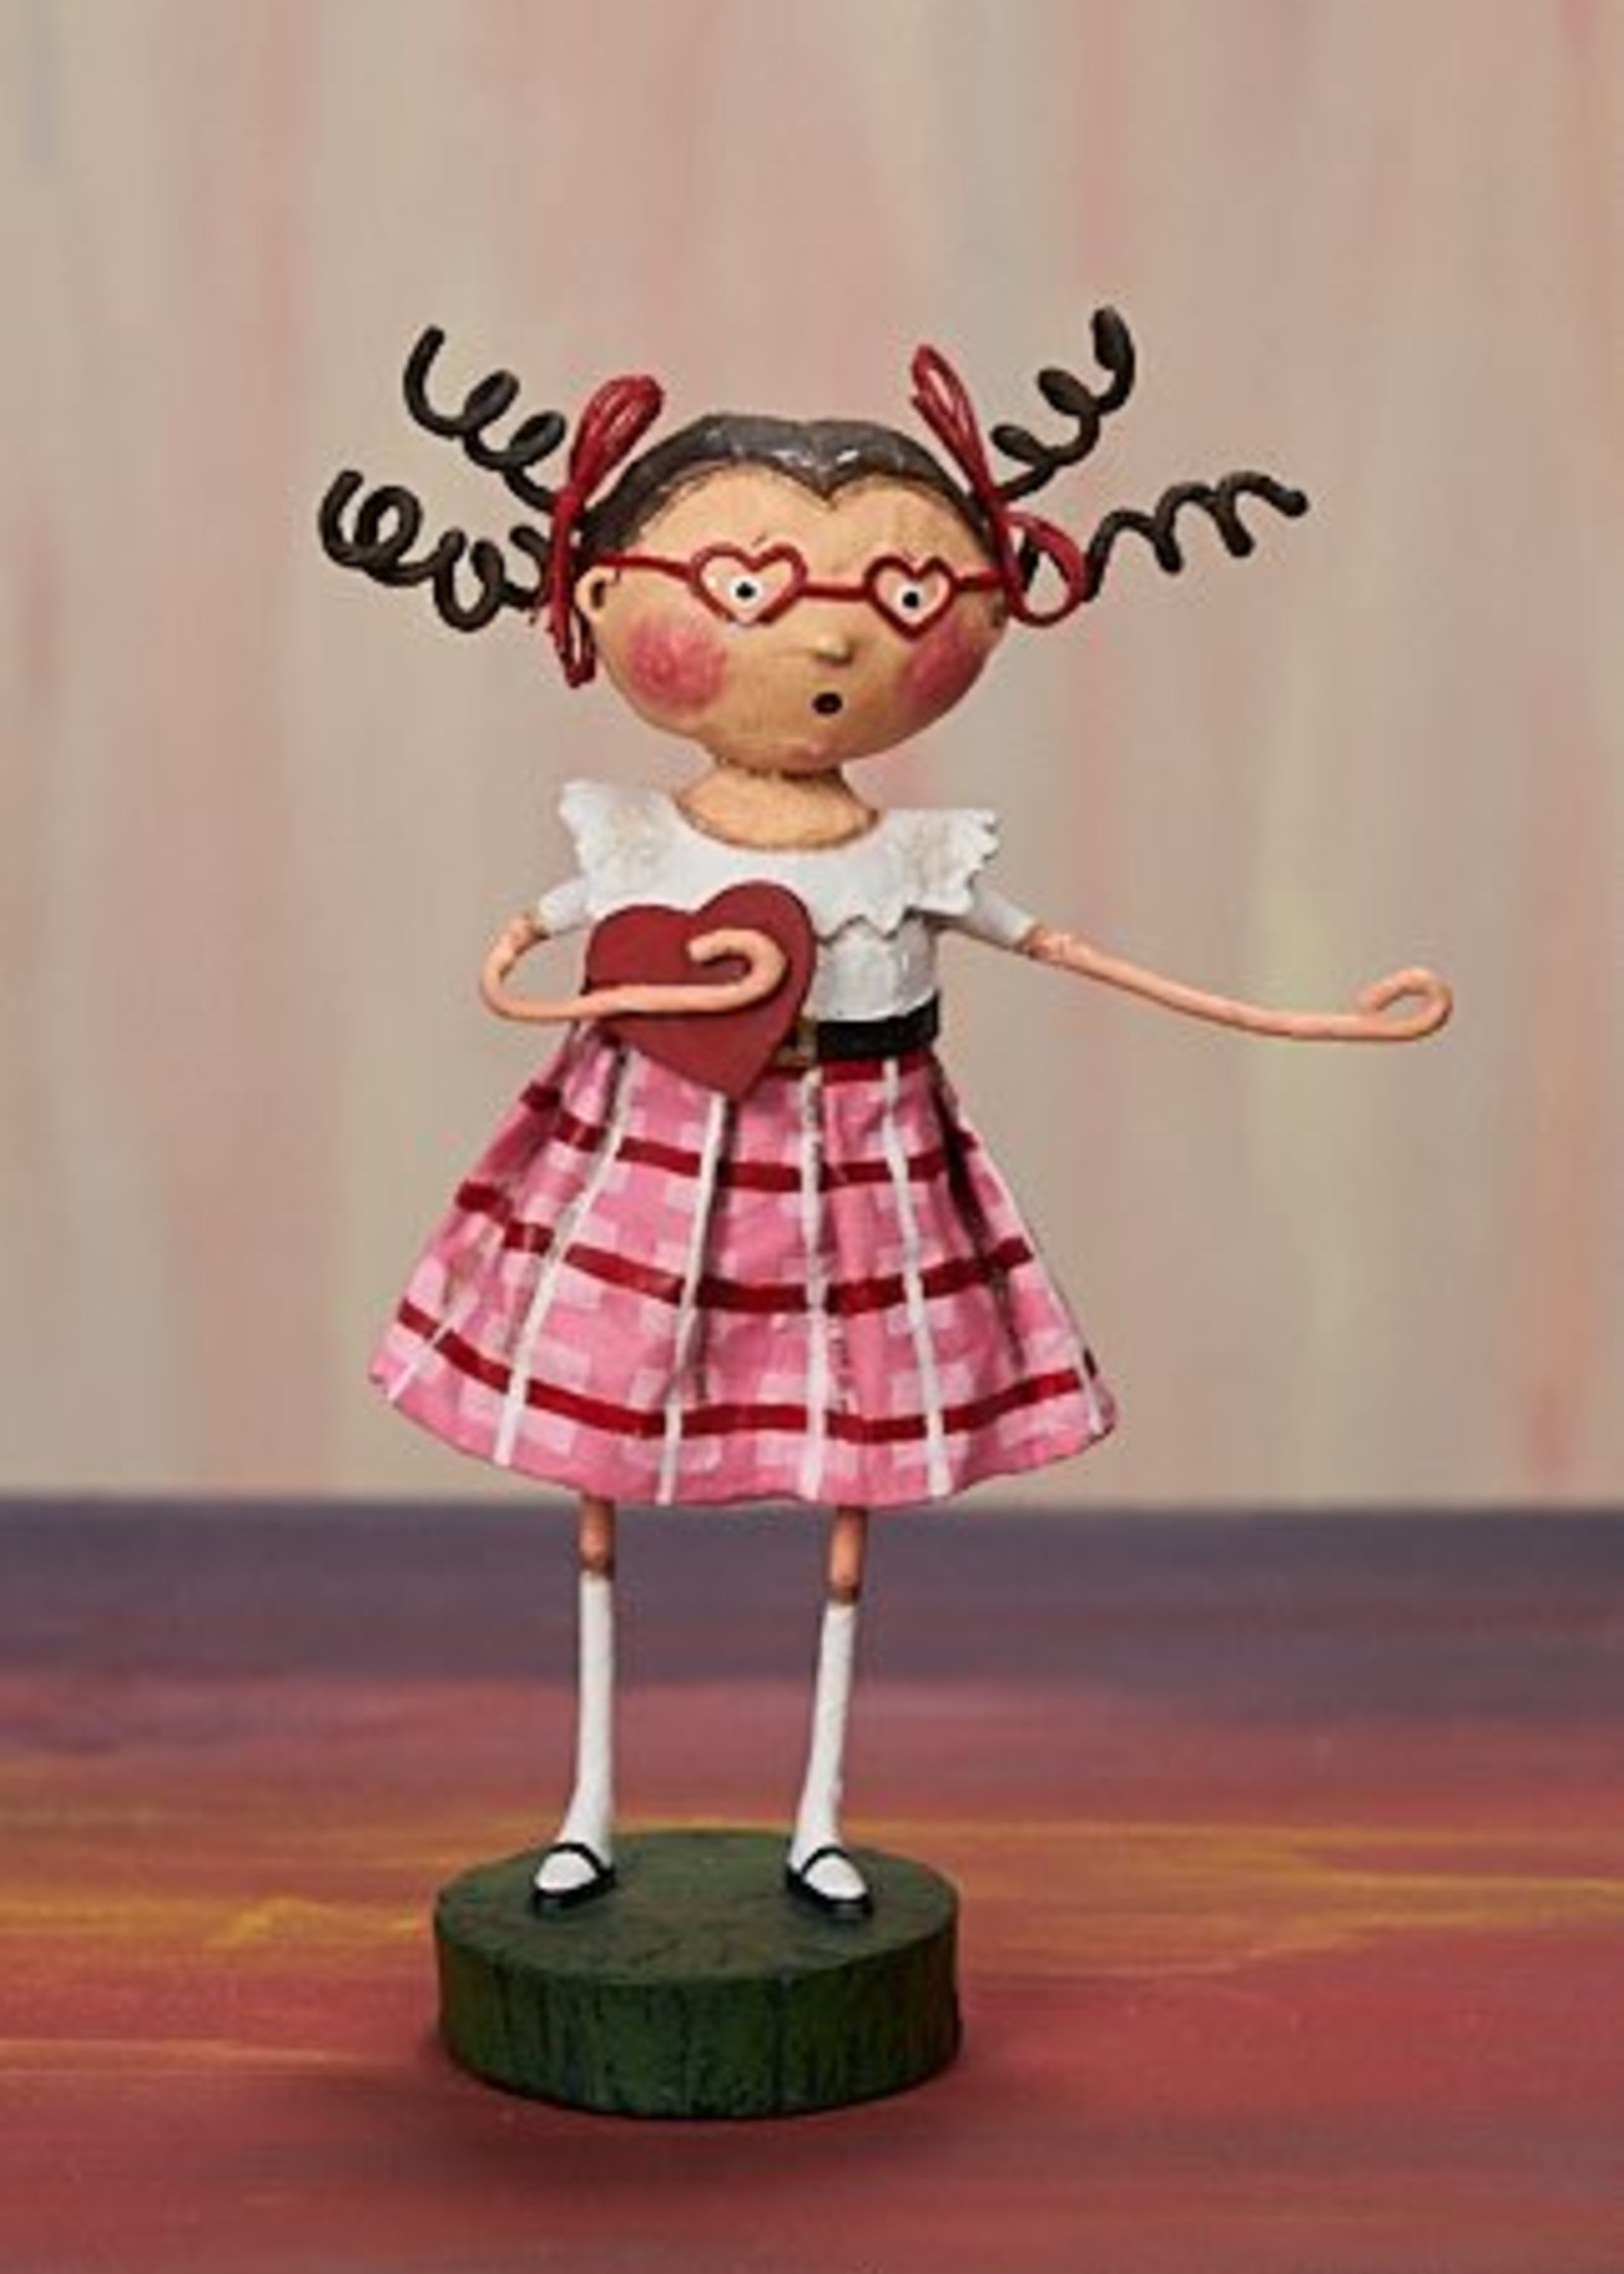 ESC & Company Professing My Love Figurine